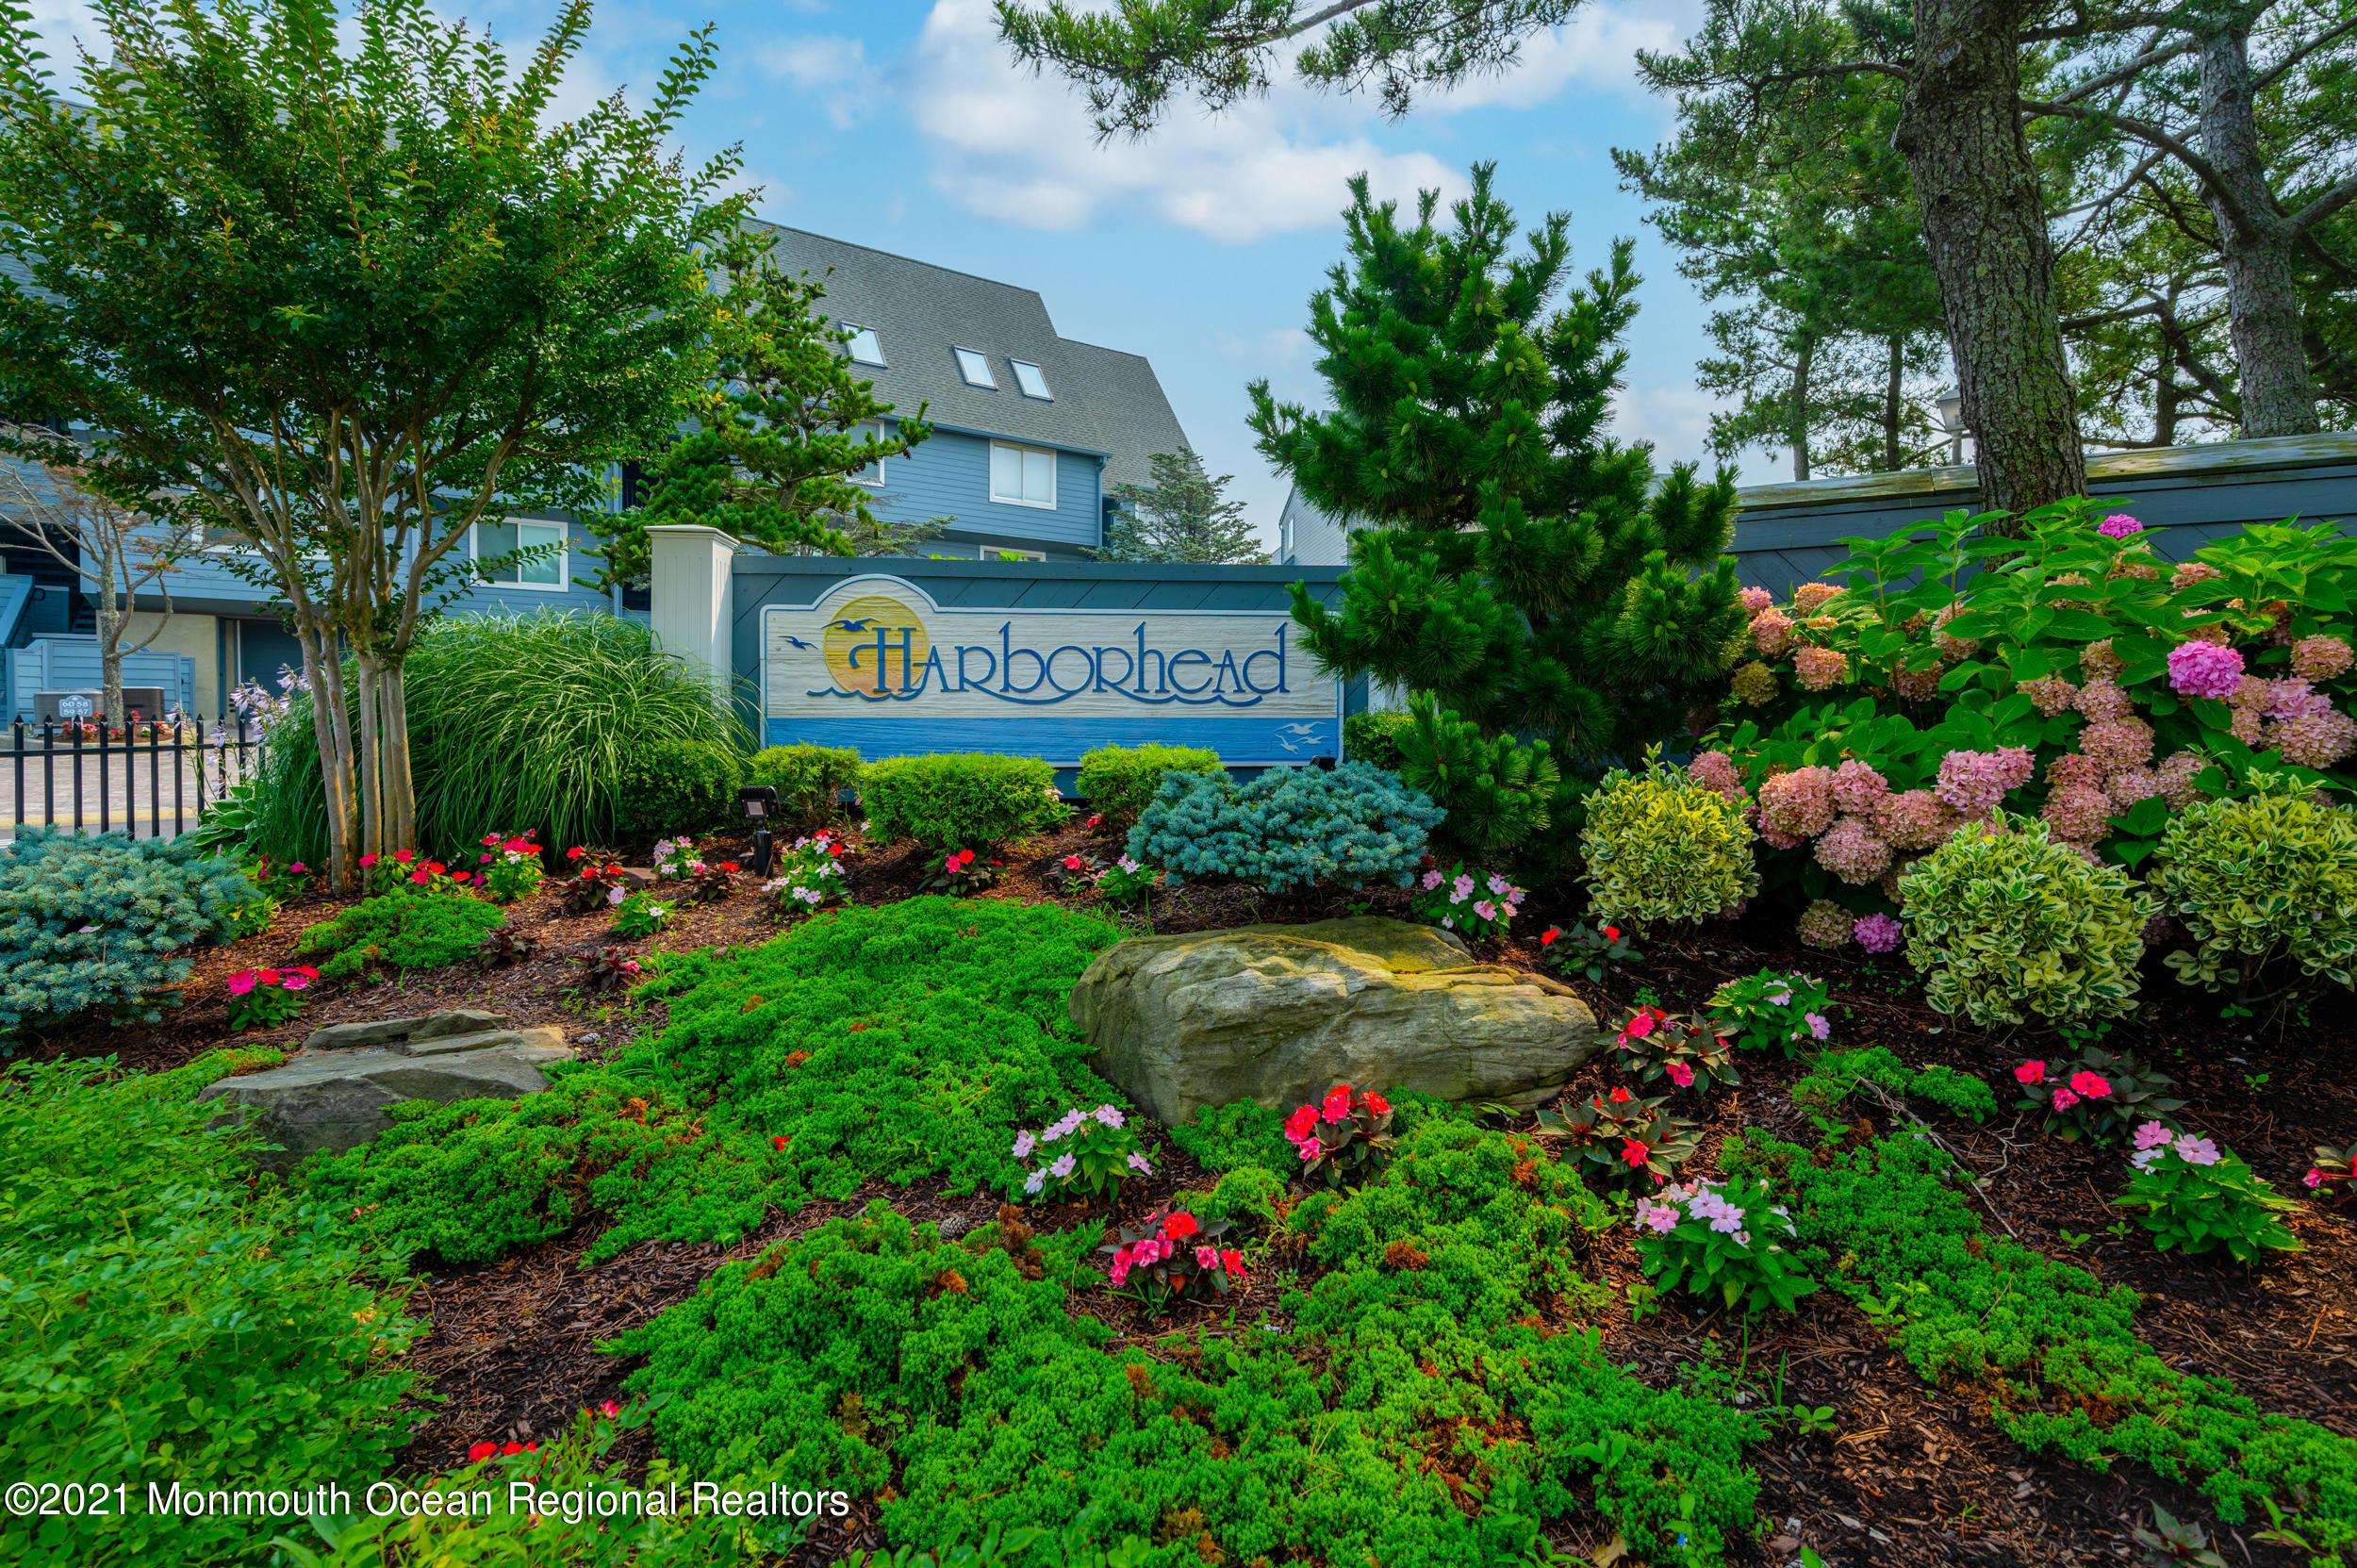 55 Harborhead Drive # 55, Point Pleasant Beach, NJ 08742